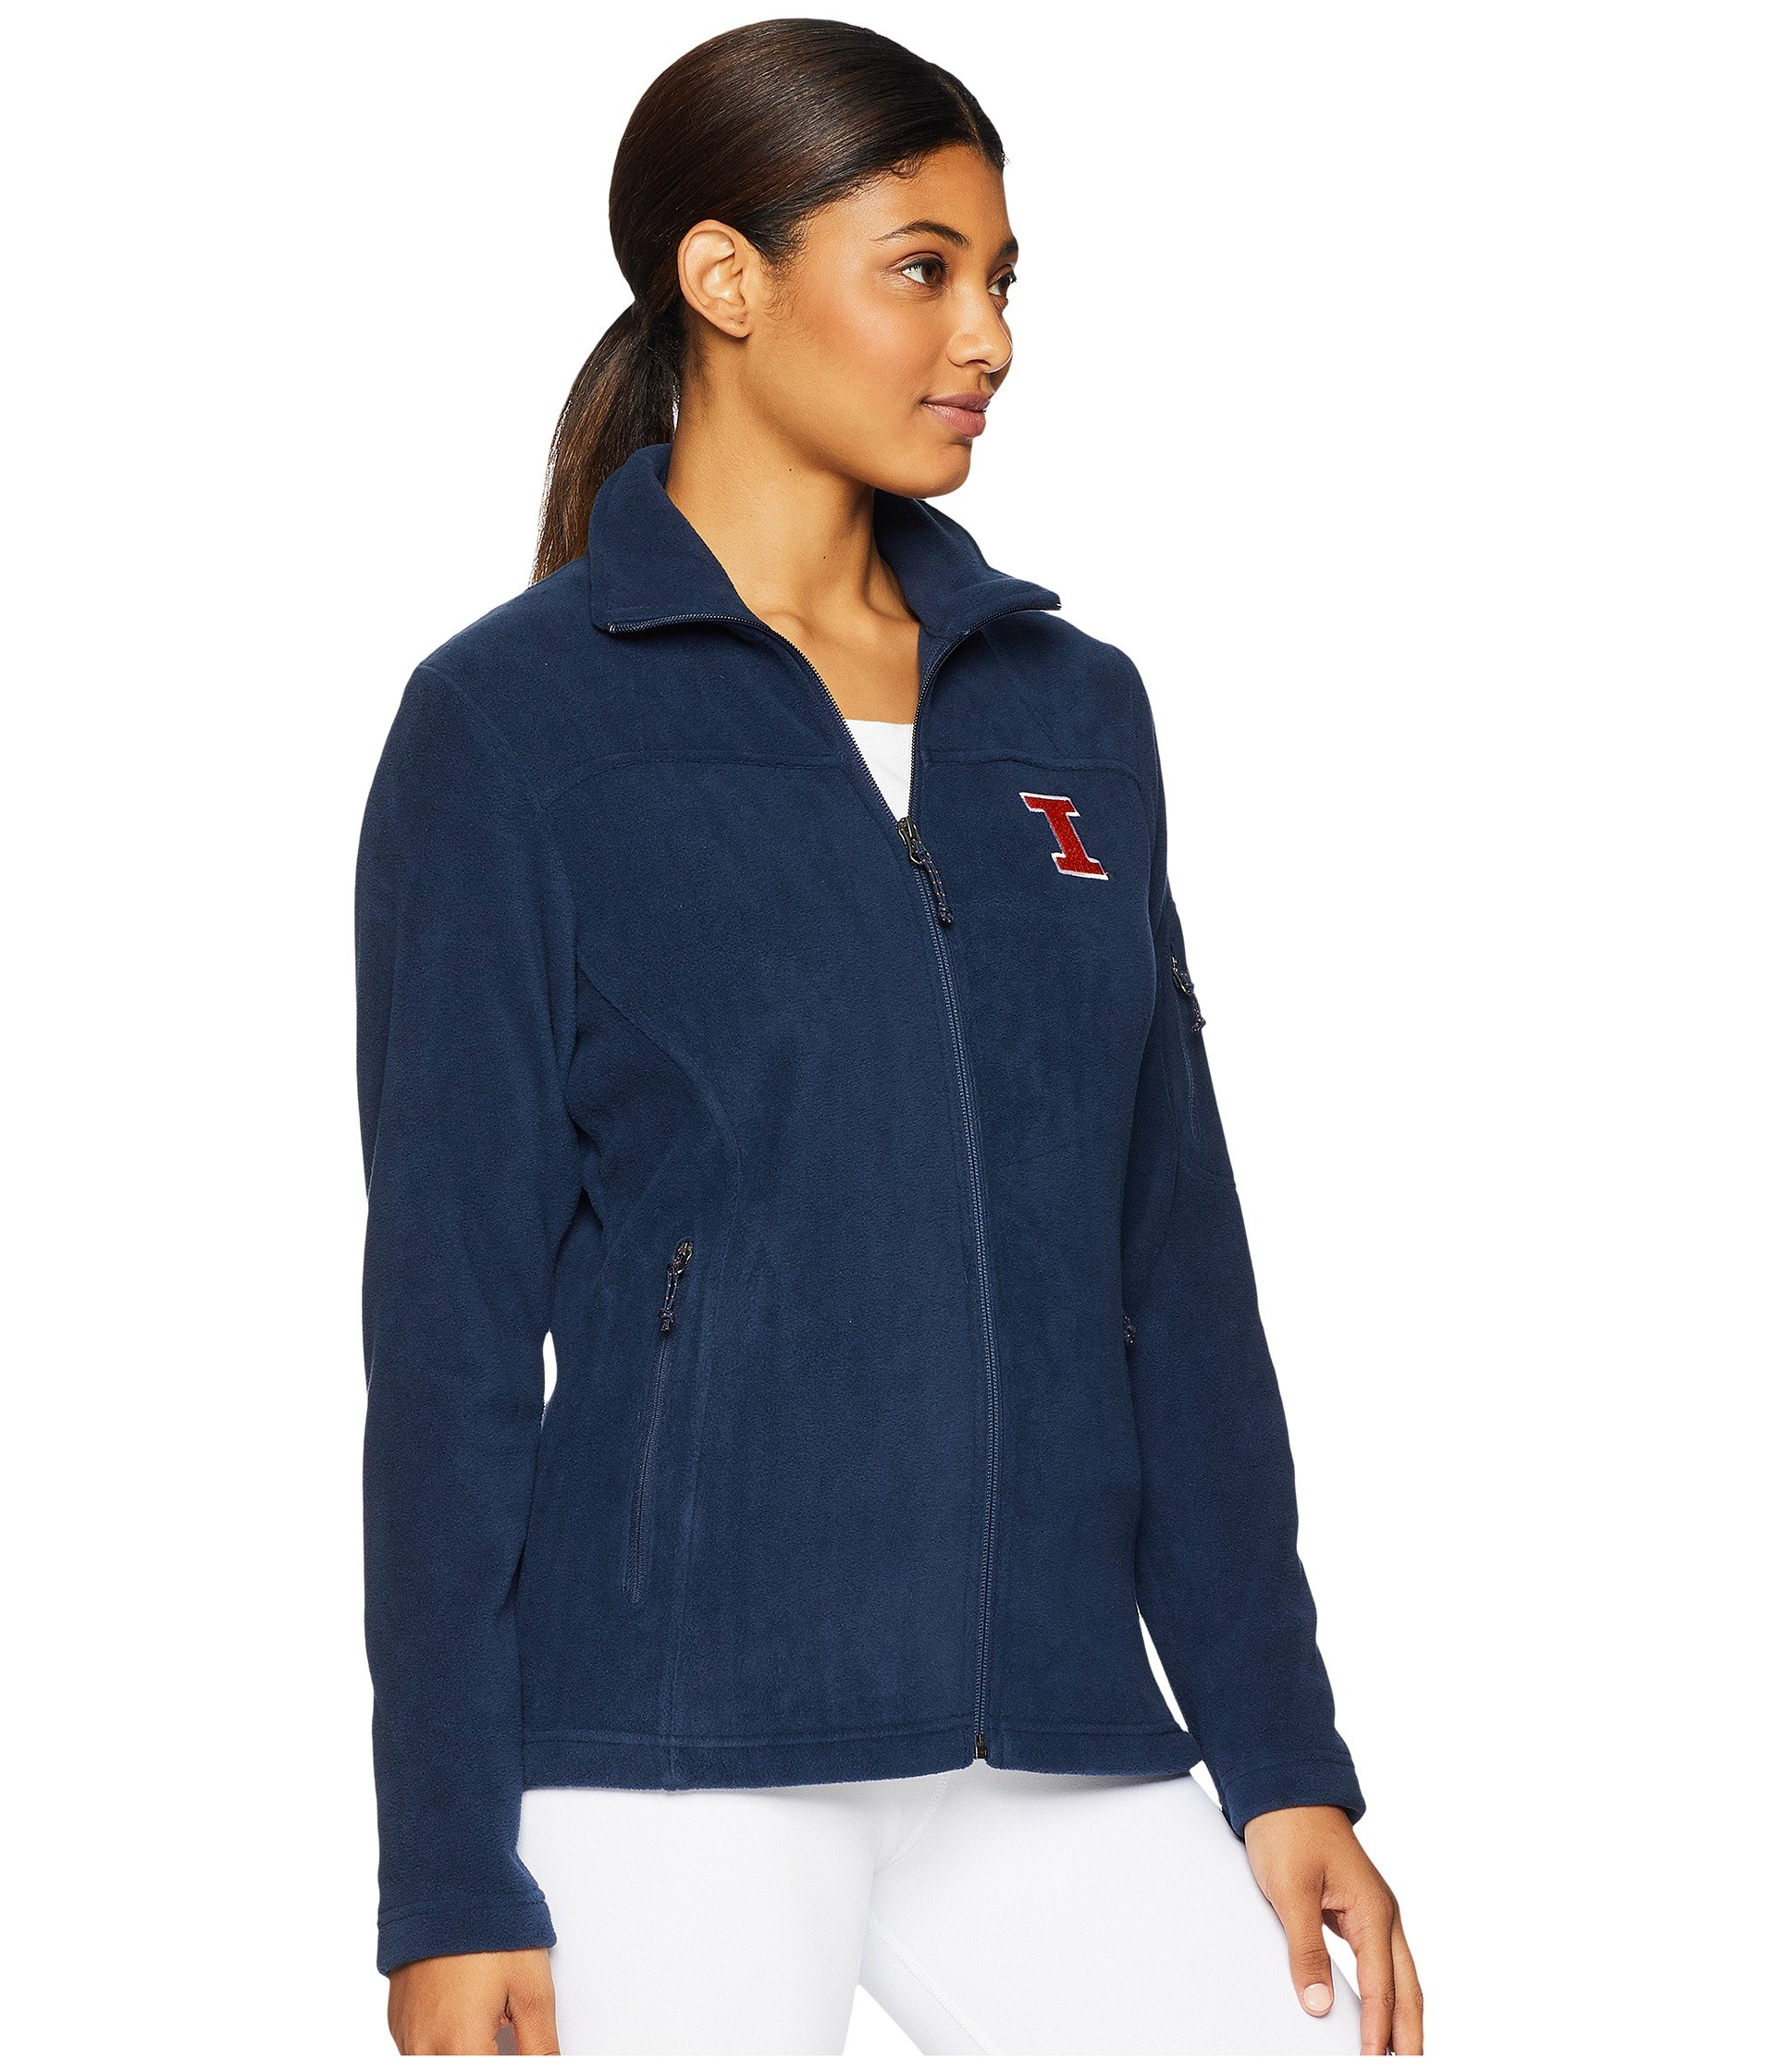 Navy Zip Ill Give Full And Fleece collegiate Go™ Columbia nxPHS8IqwI